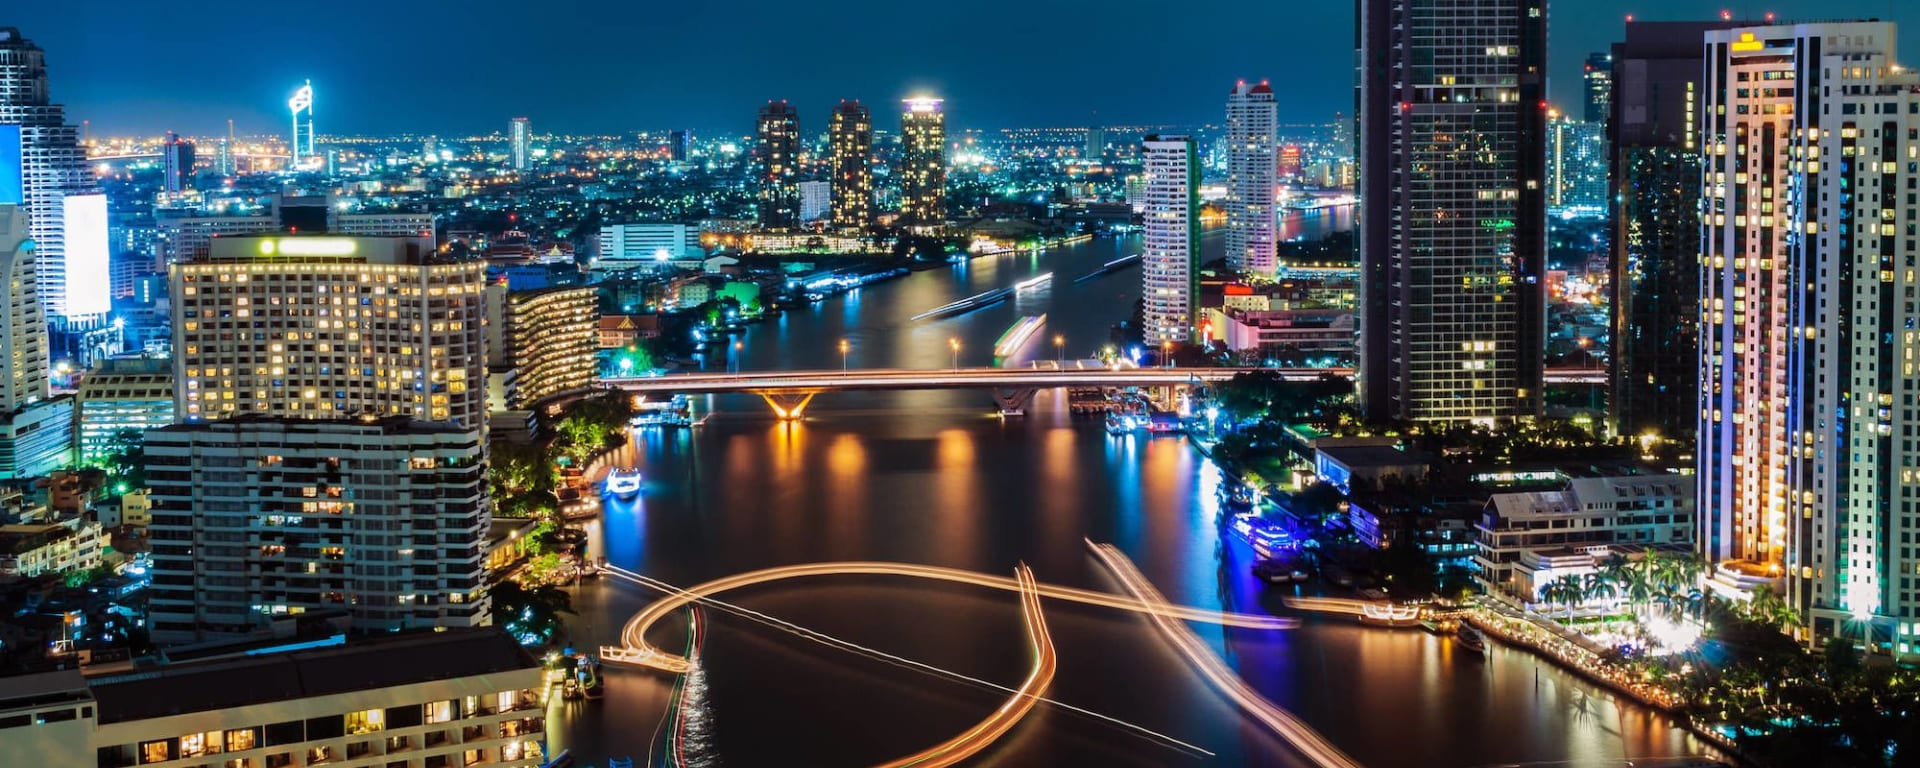 Voyages en Thaïlande | Vacances en Asie par tourasia: Bangkok